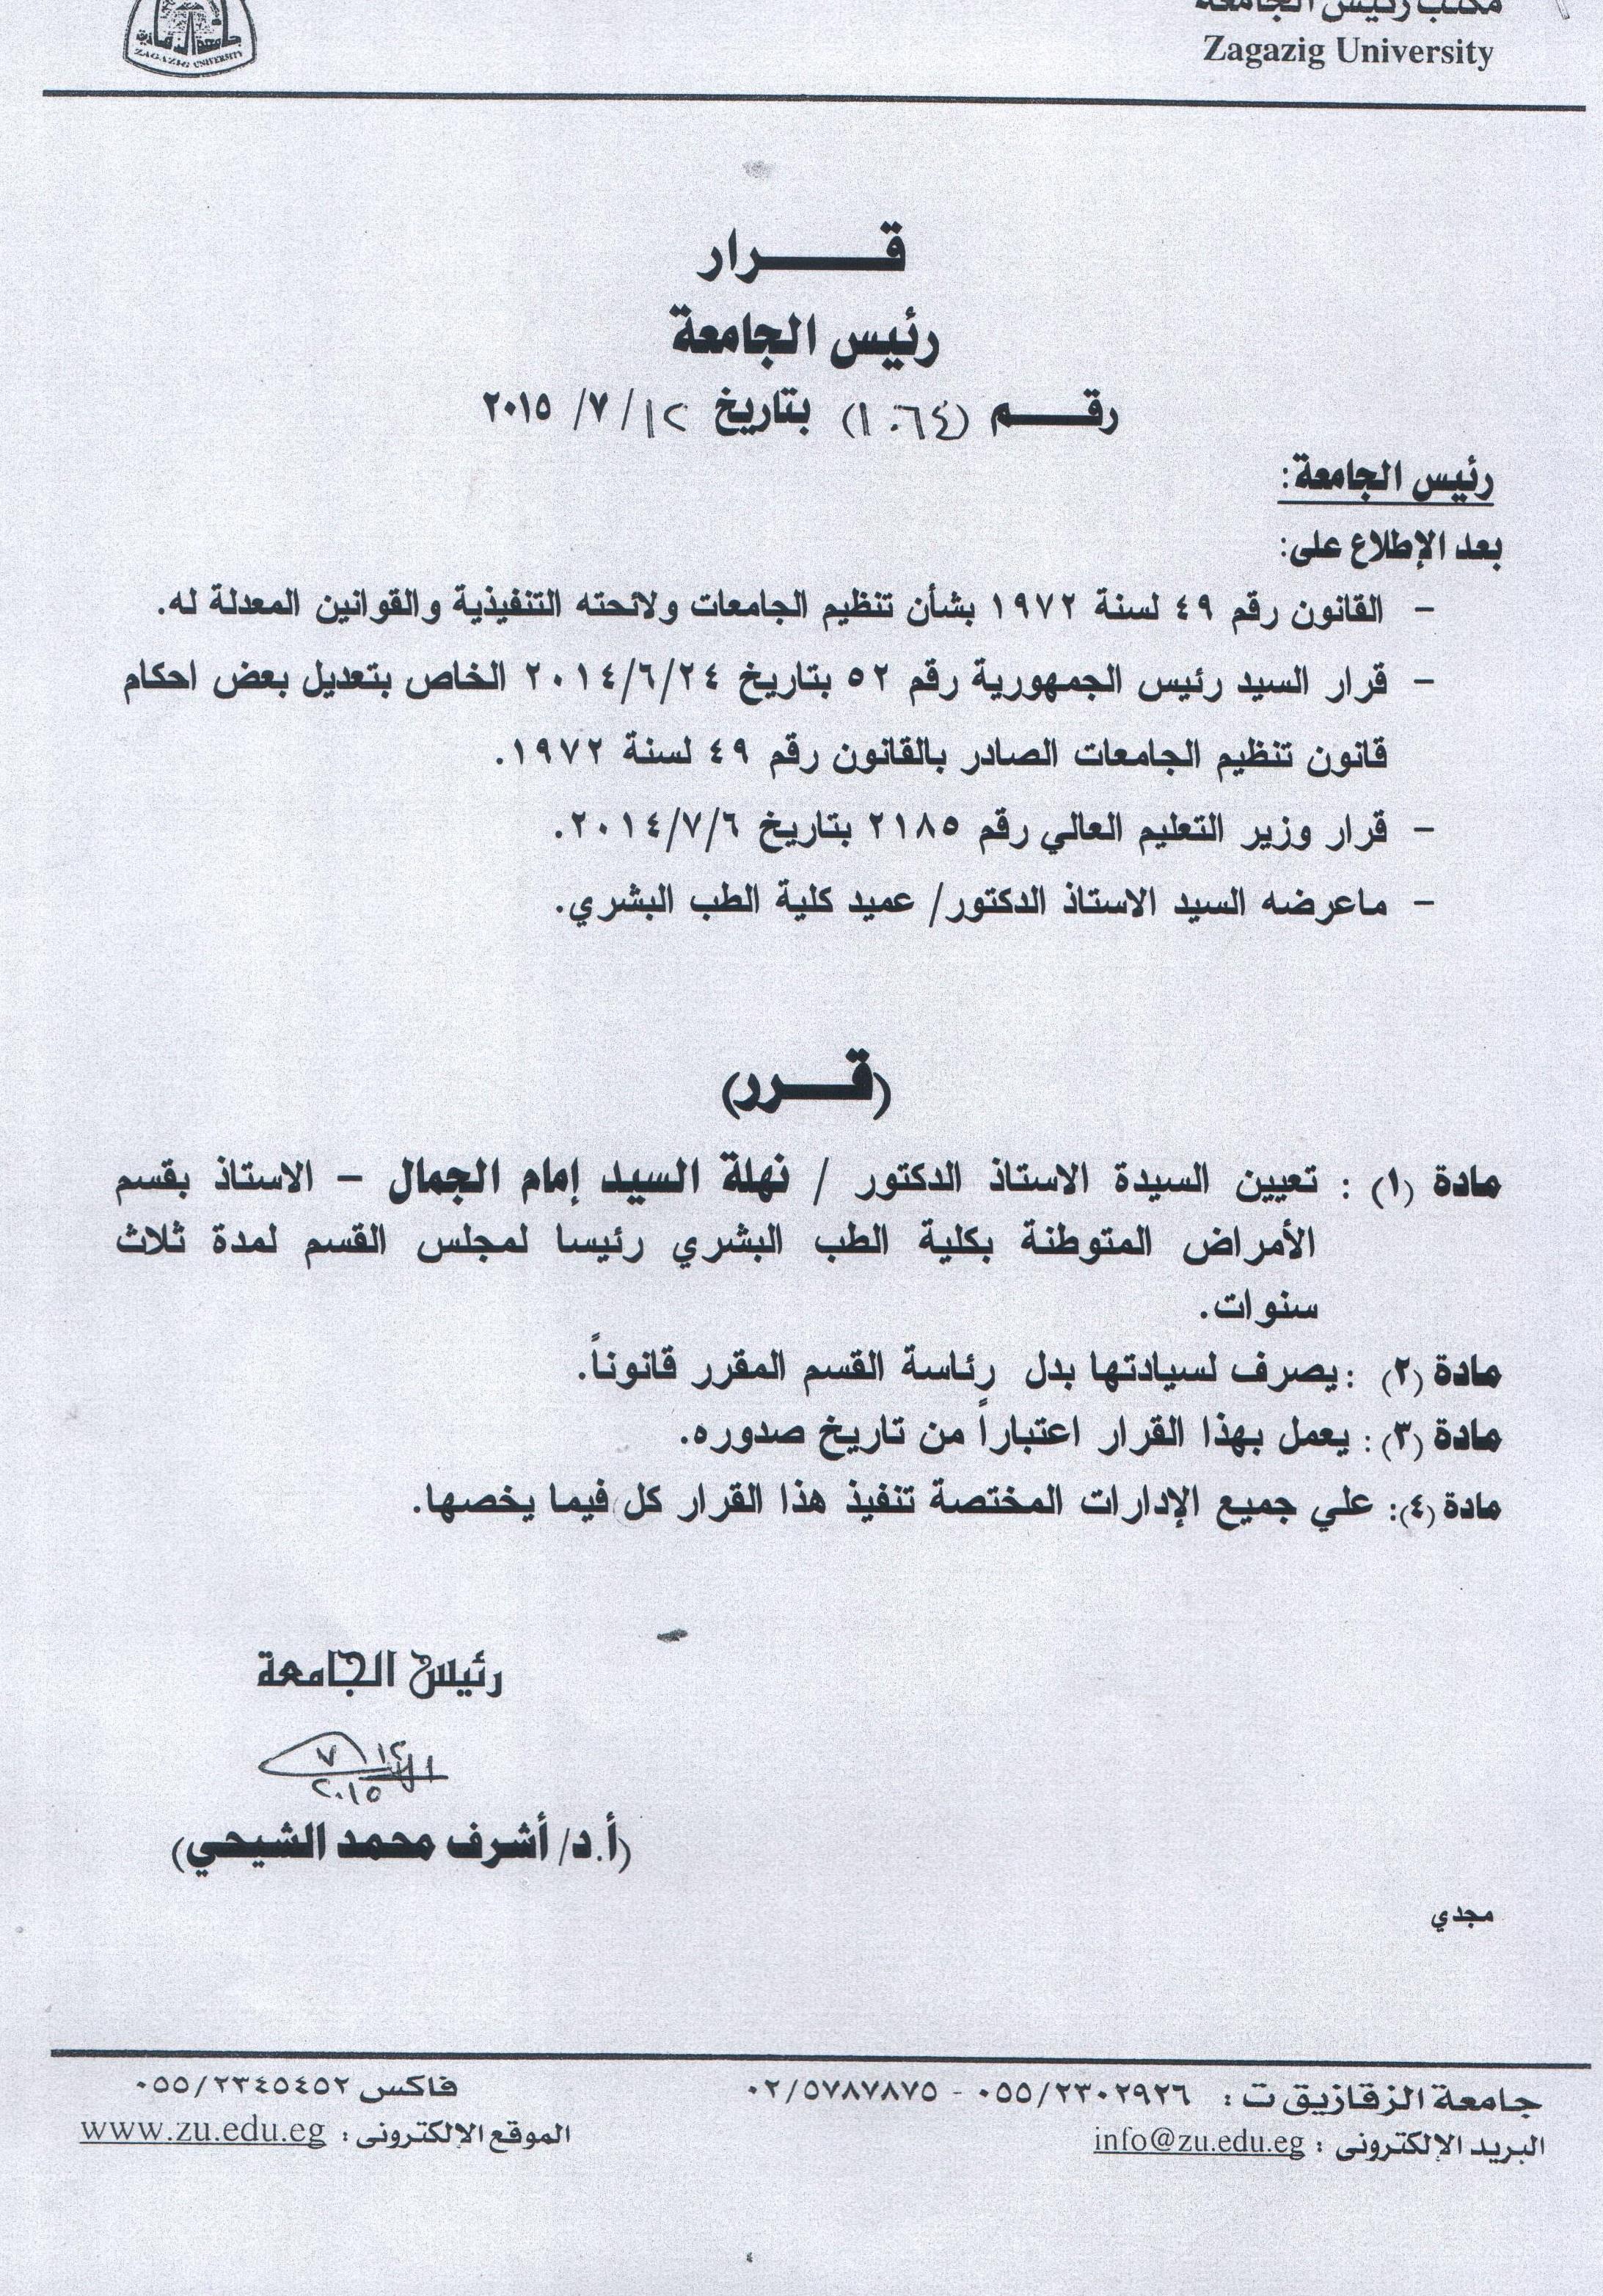 Nahla algammal chairman of the Department of endemic diseases